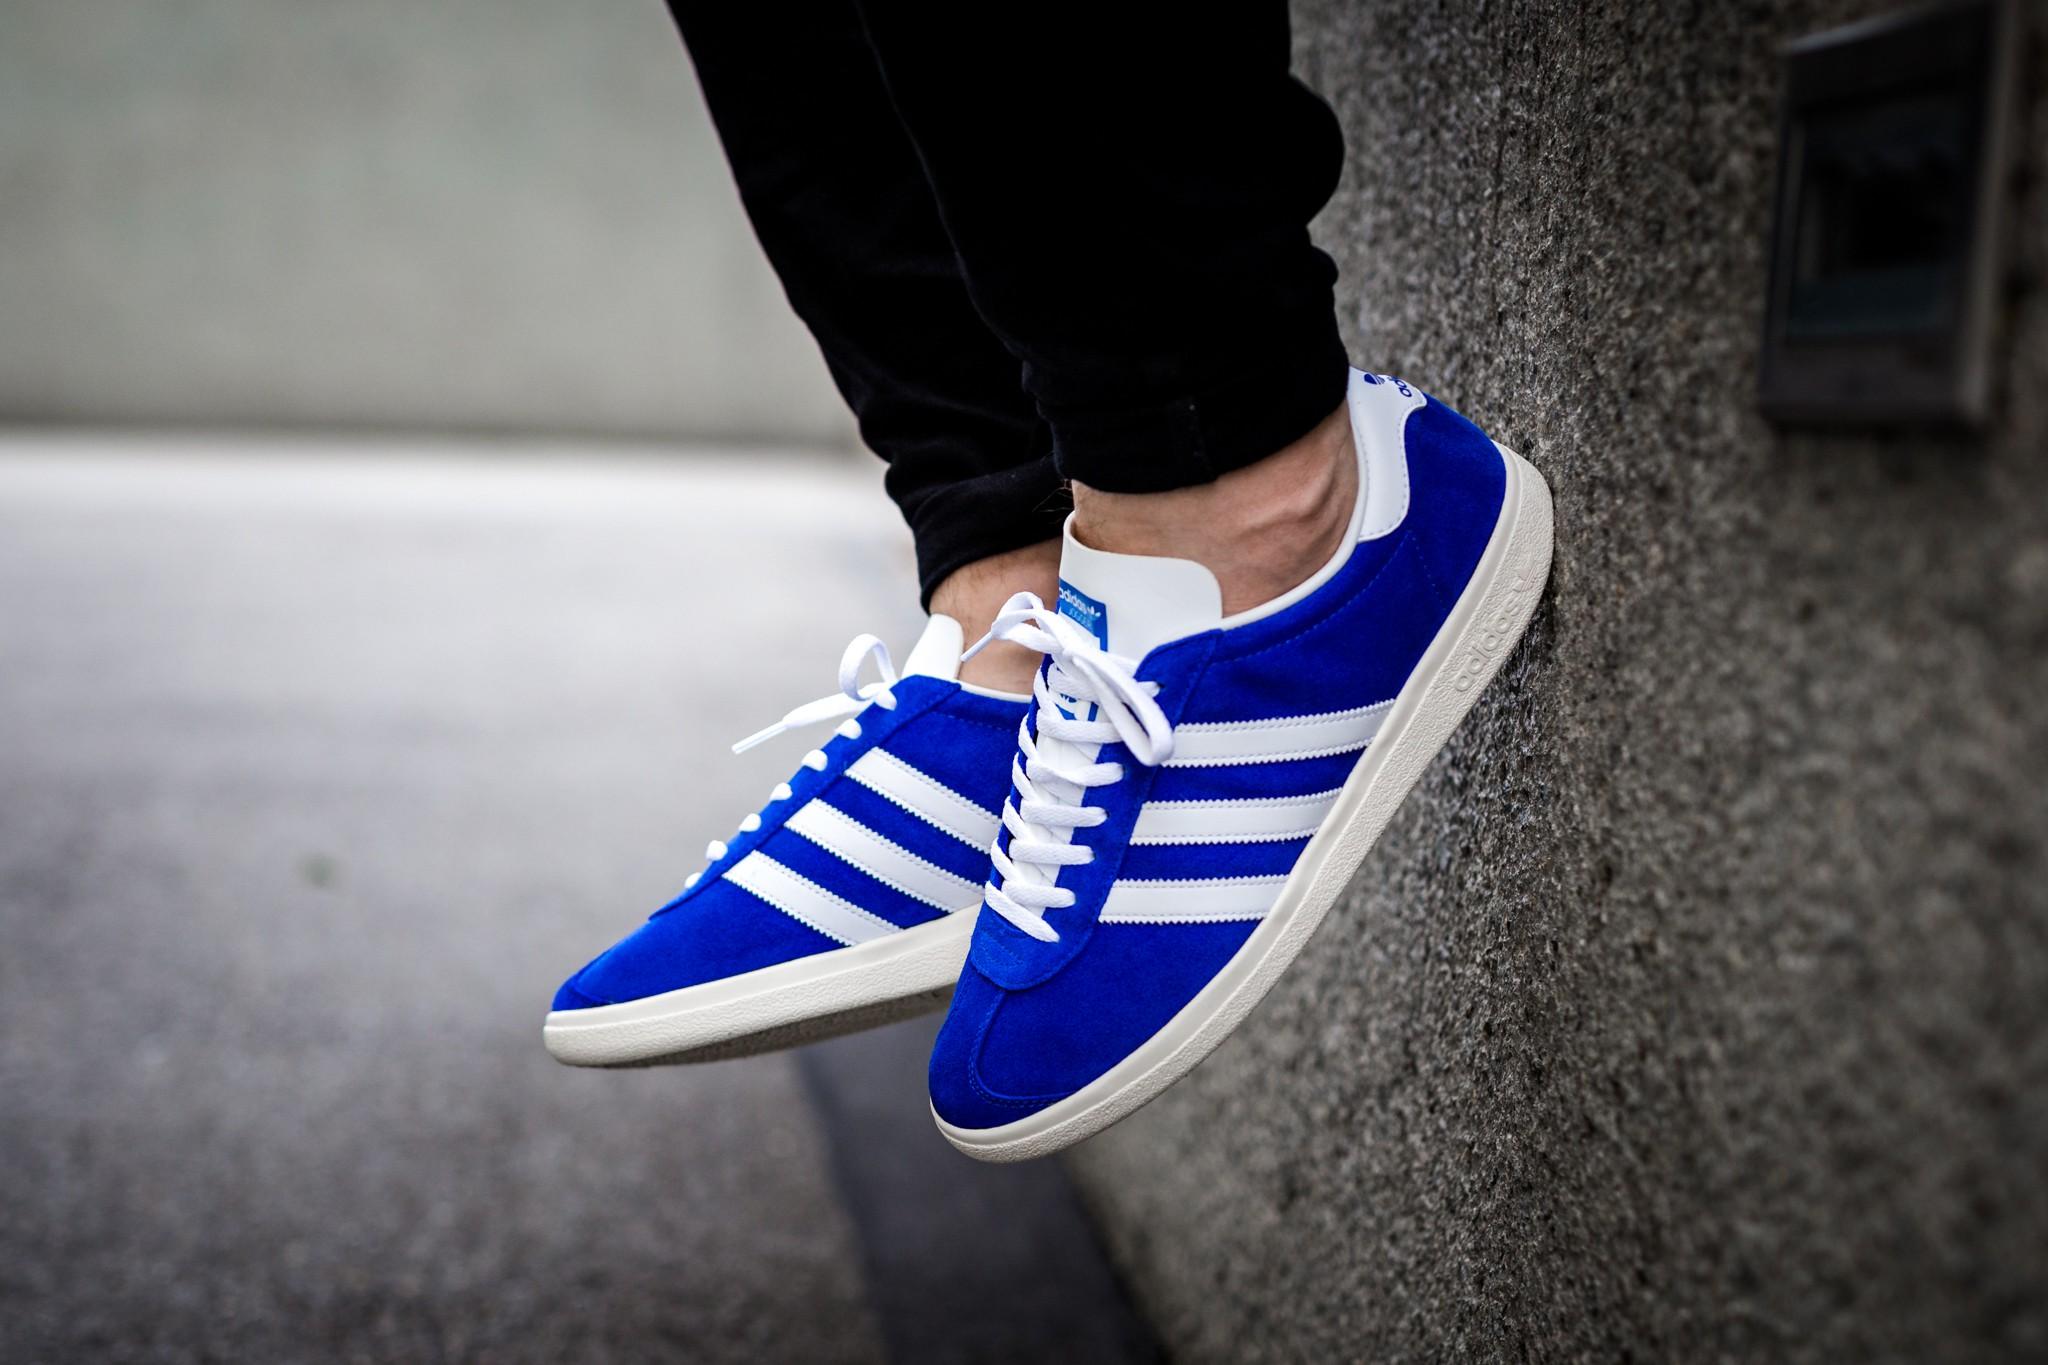 Basket Adidas Jogger Spezial Bluebird (1)